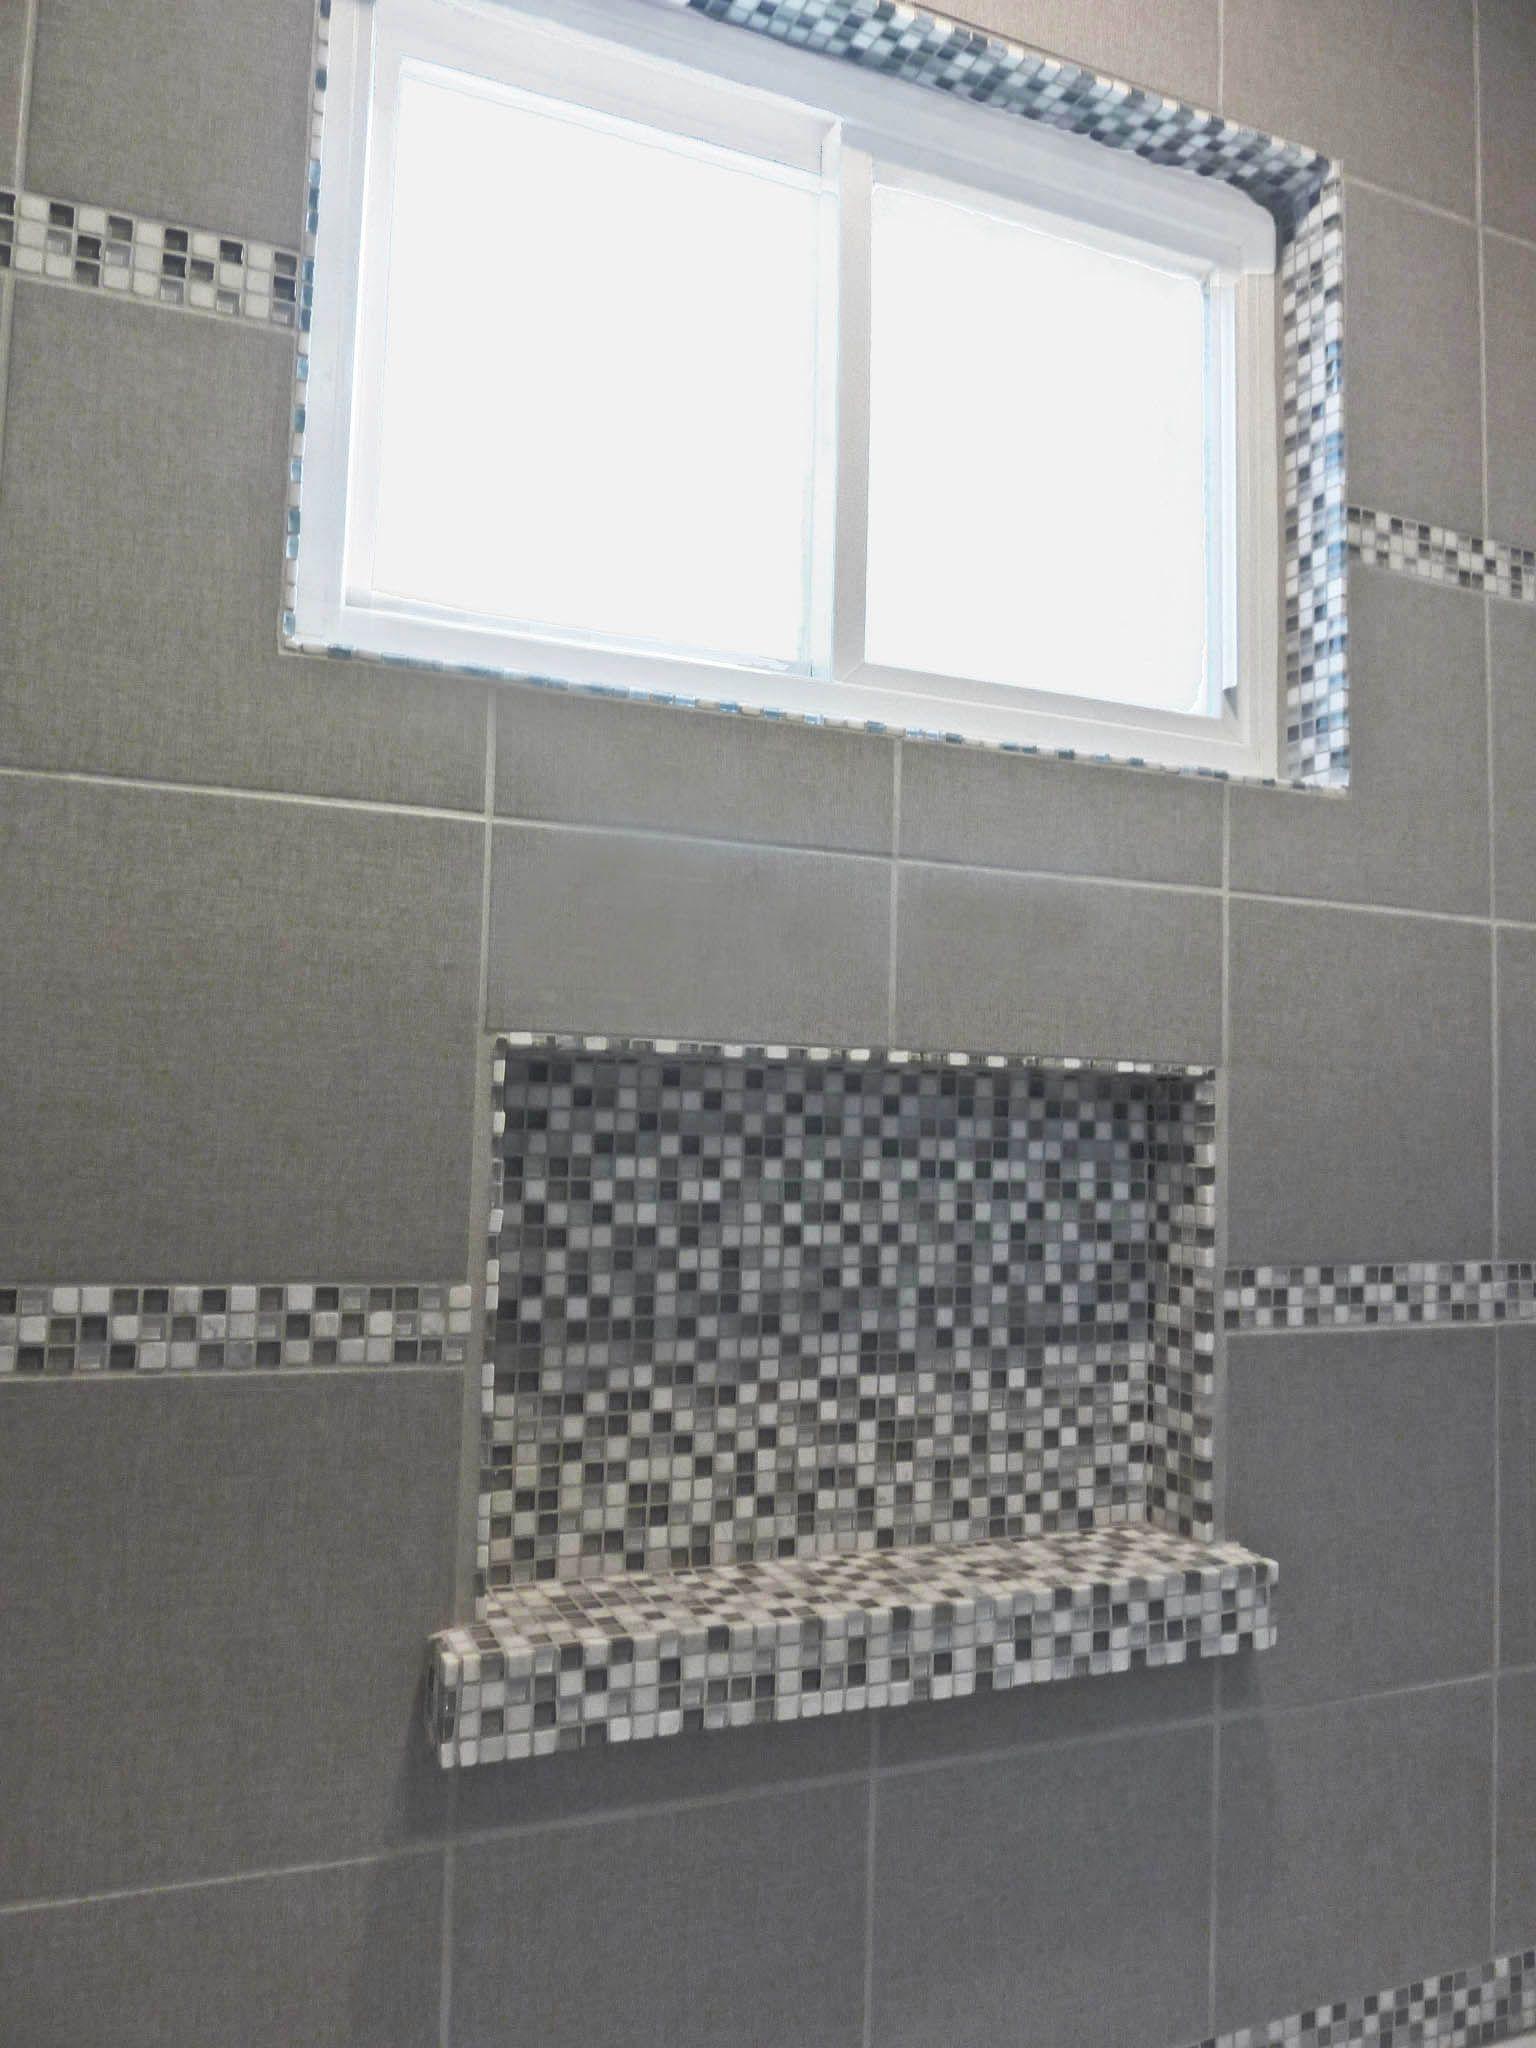 Shower Niche In Glass Mosaic Tile Shower Niche Glass Mosaic